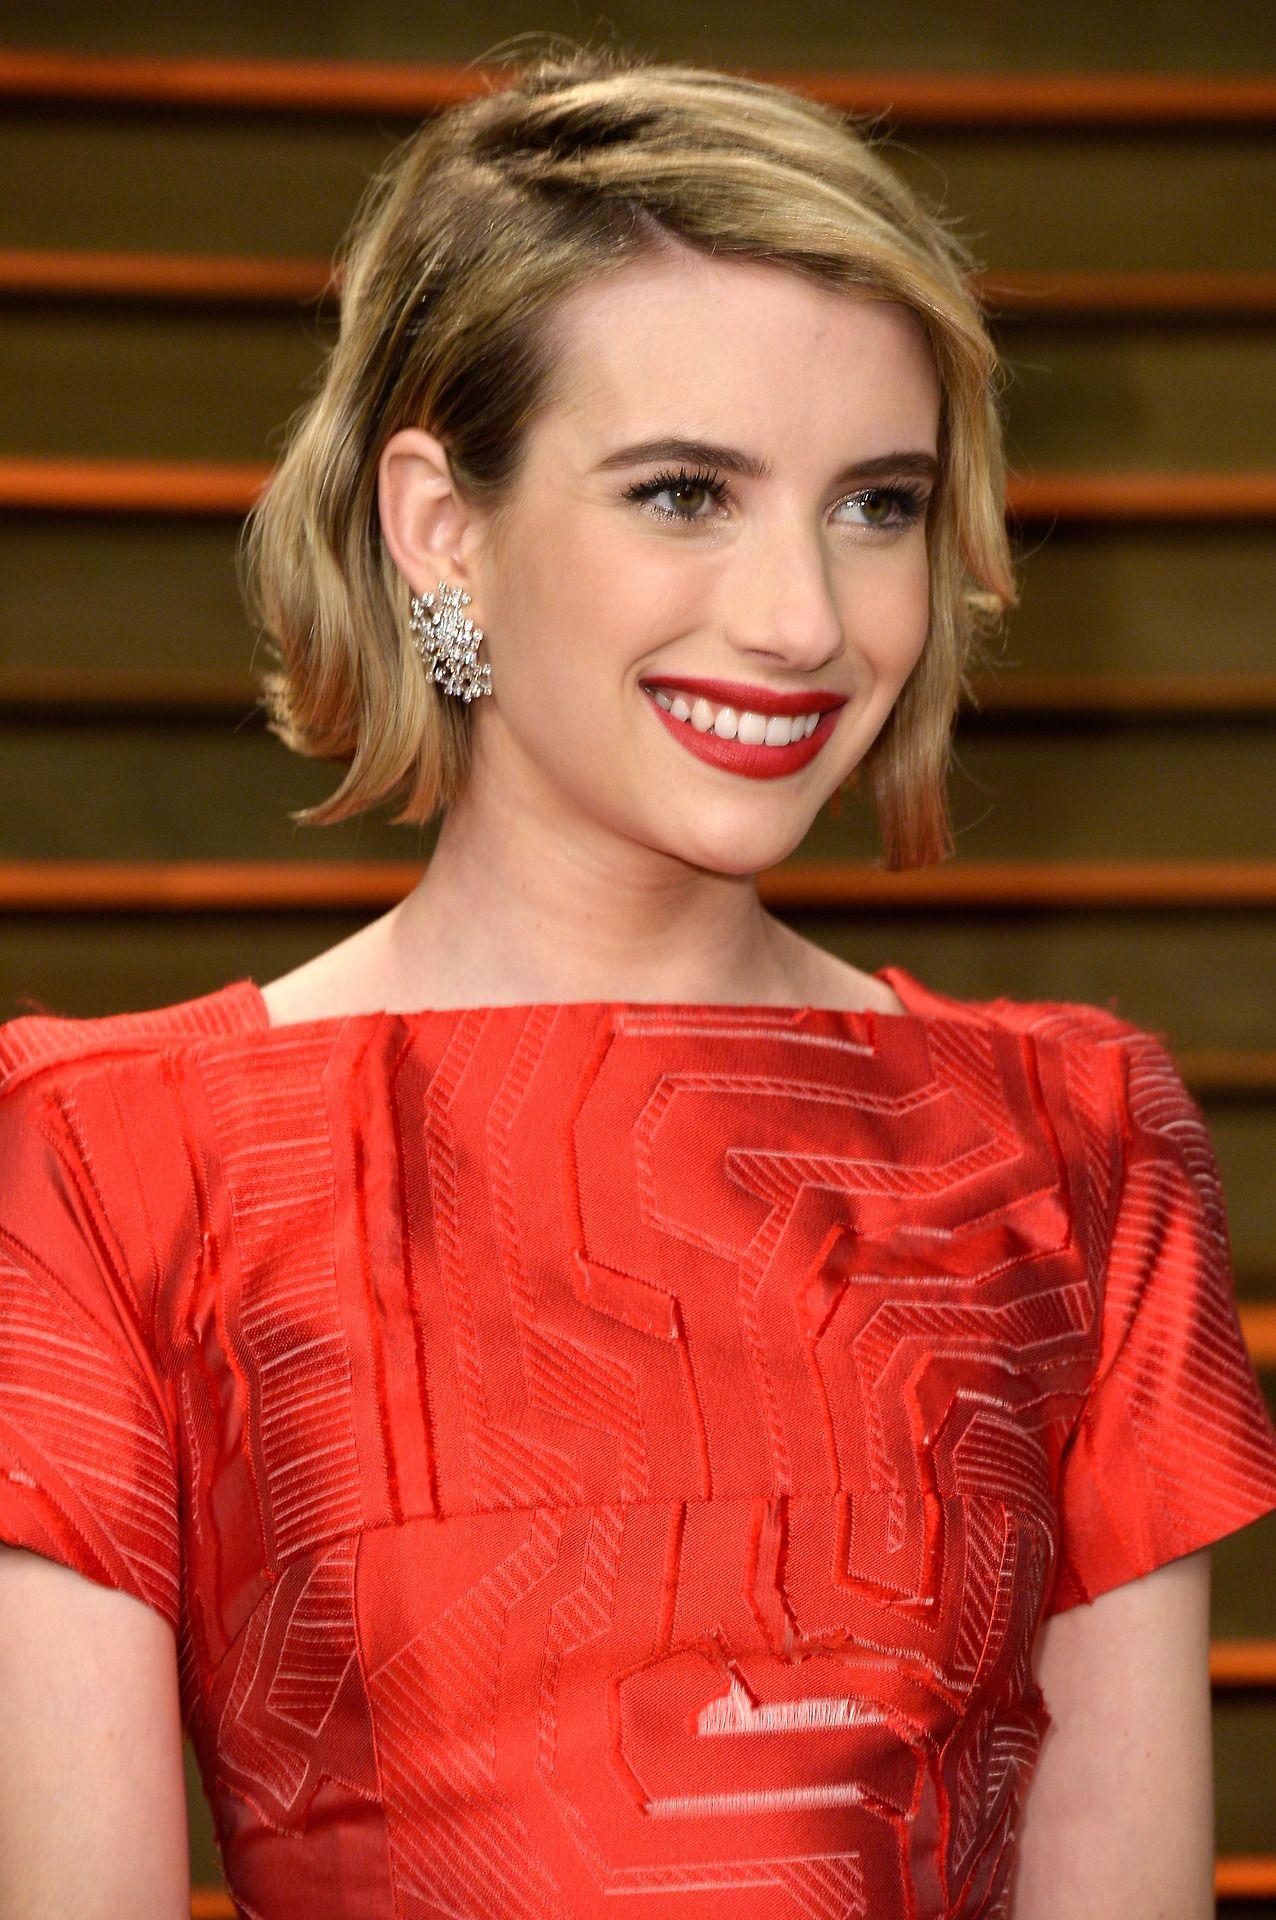 Celebinspired date night makeup ideas emma roberts red